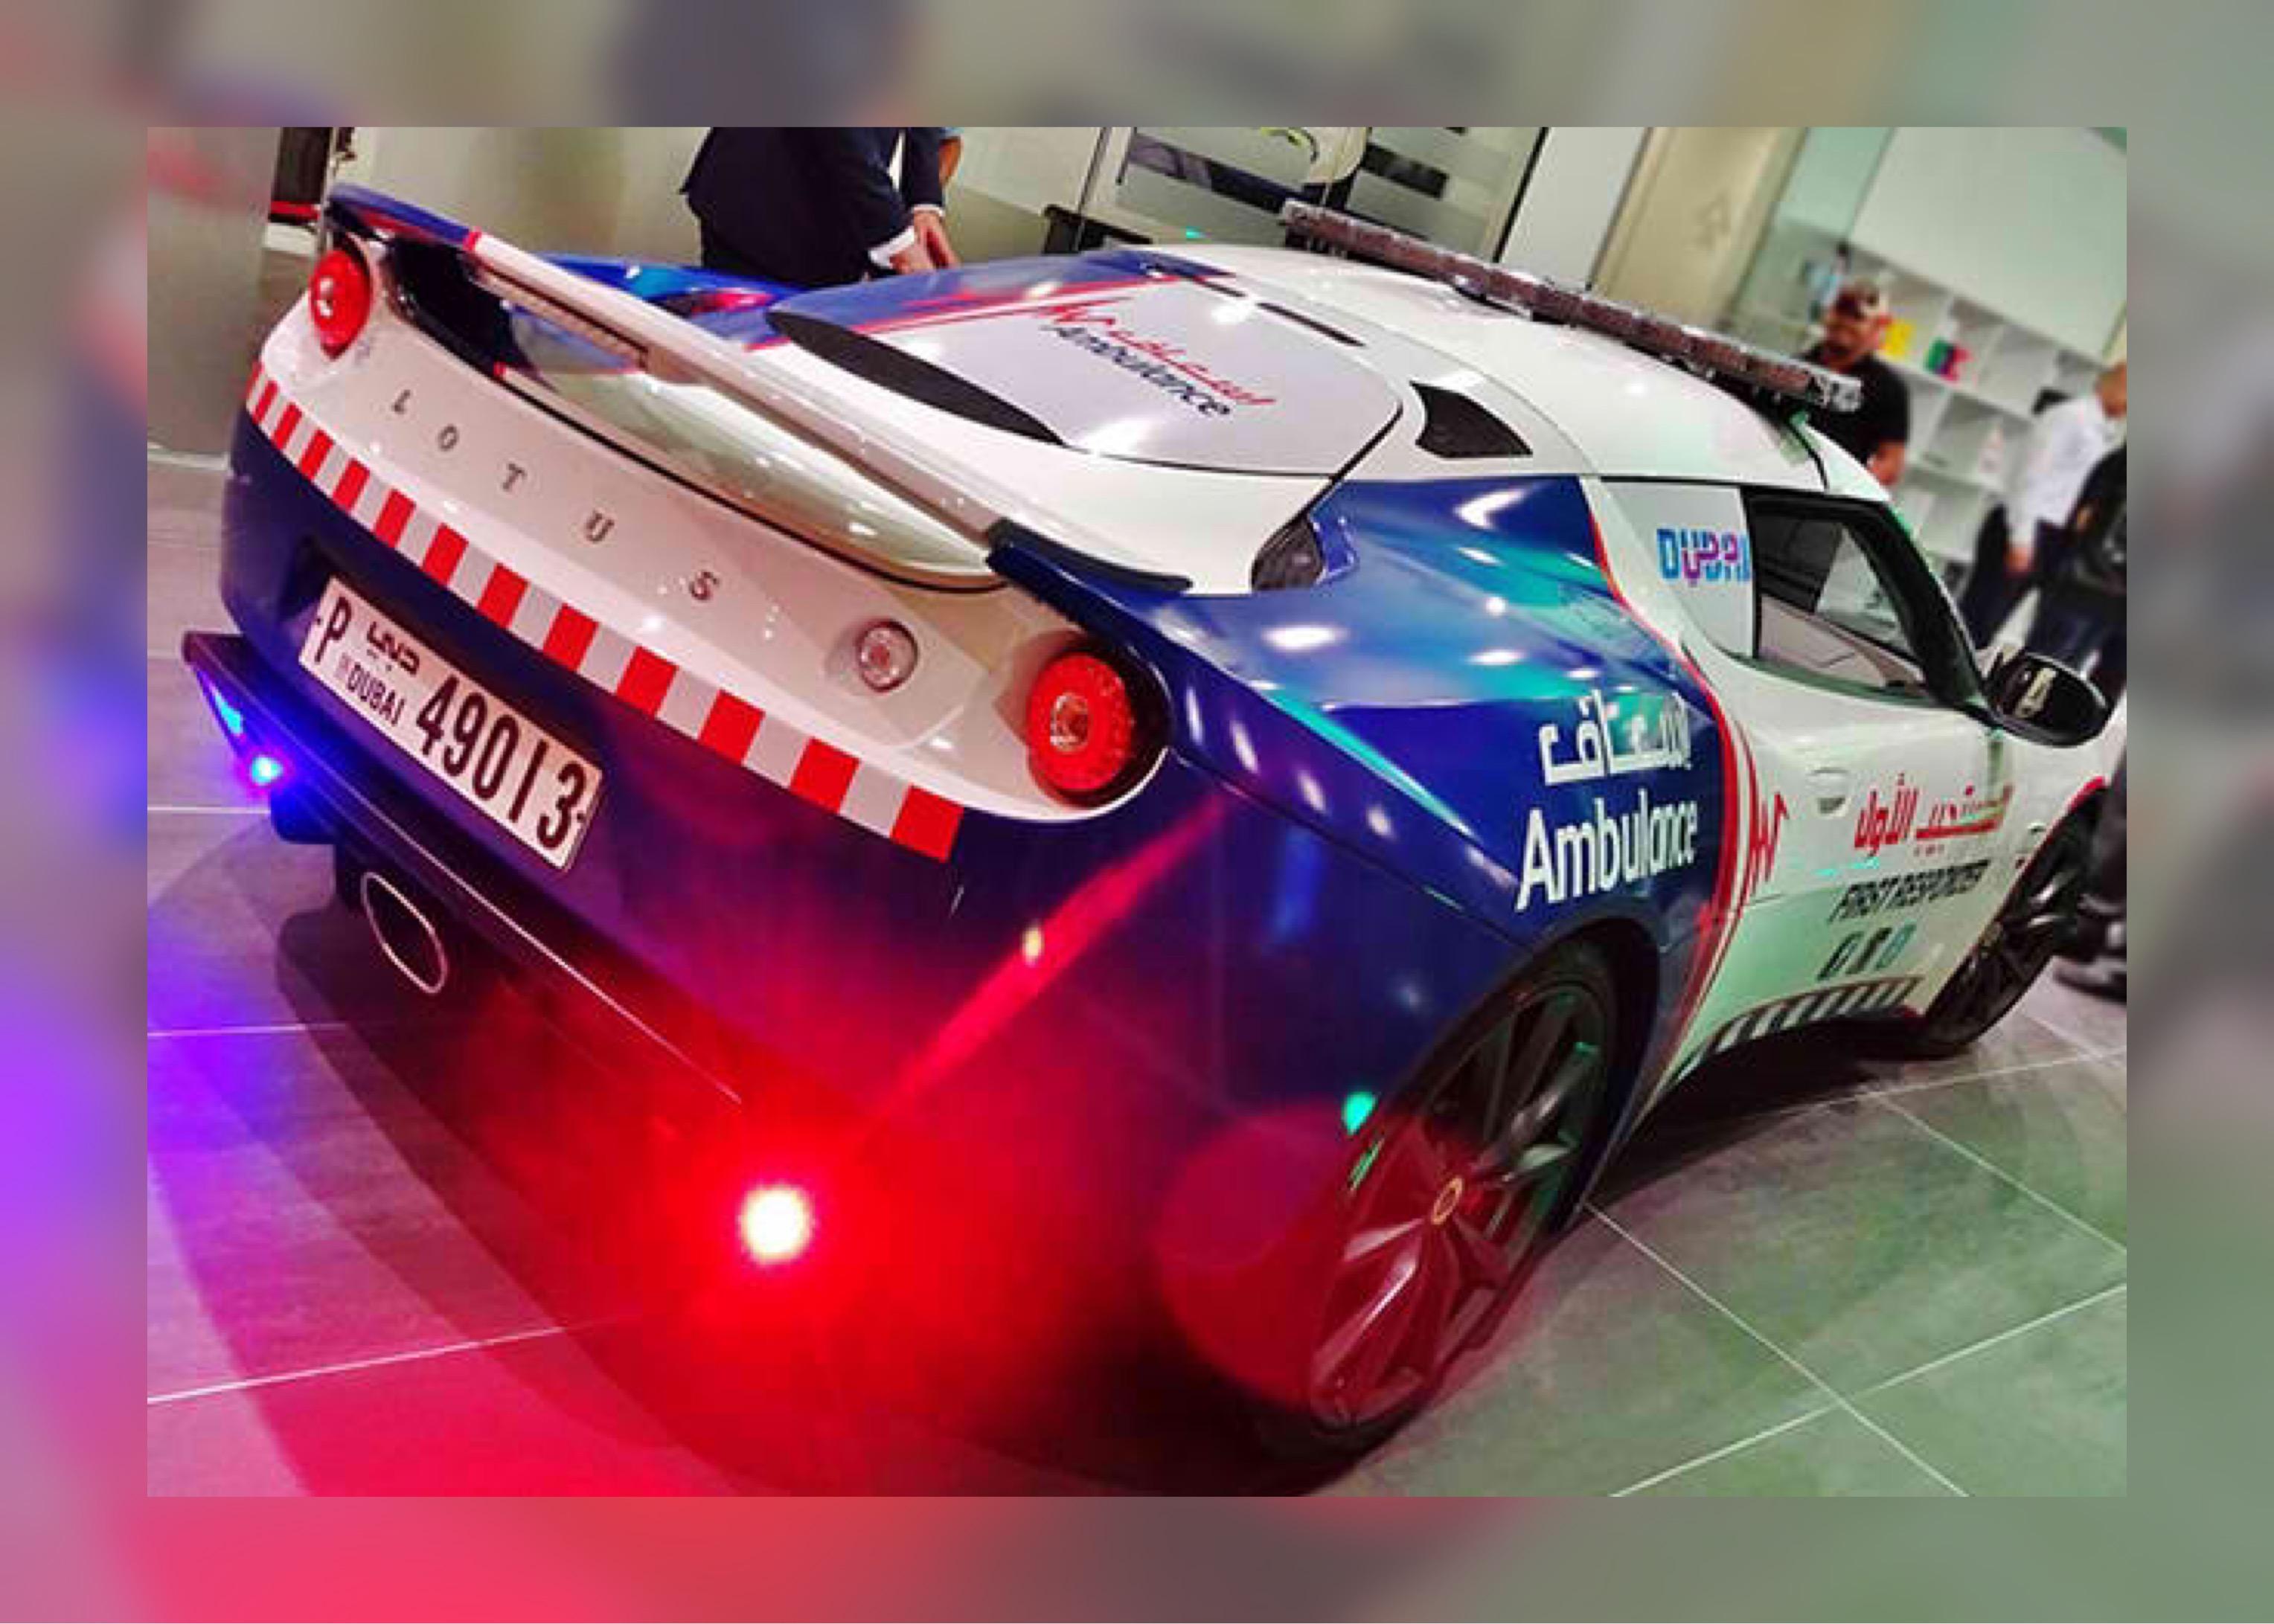 Dubai gets world's fastest ambulance